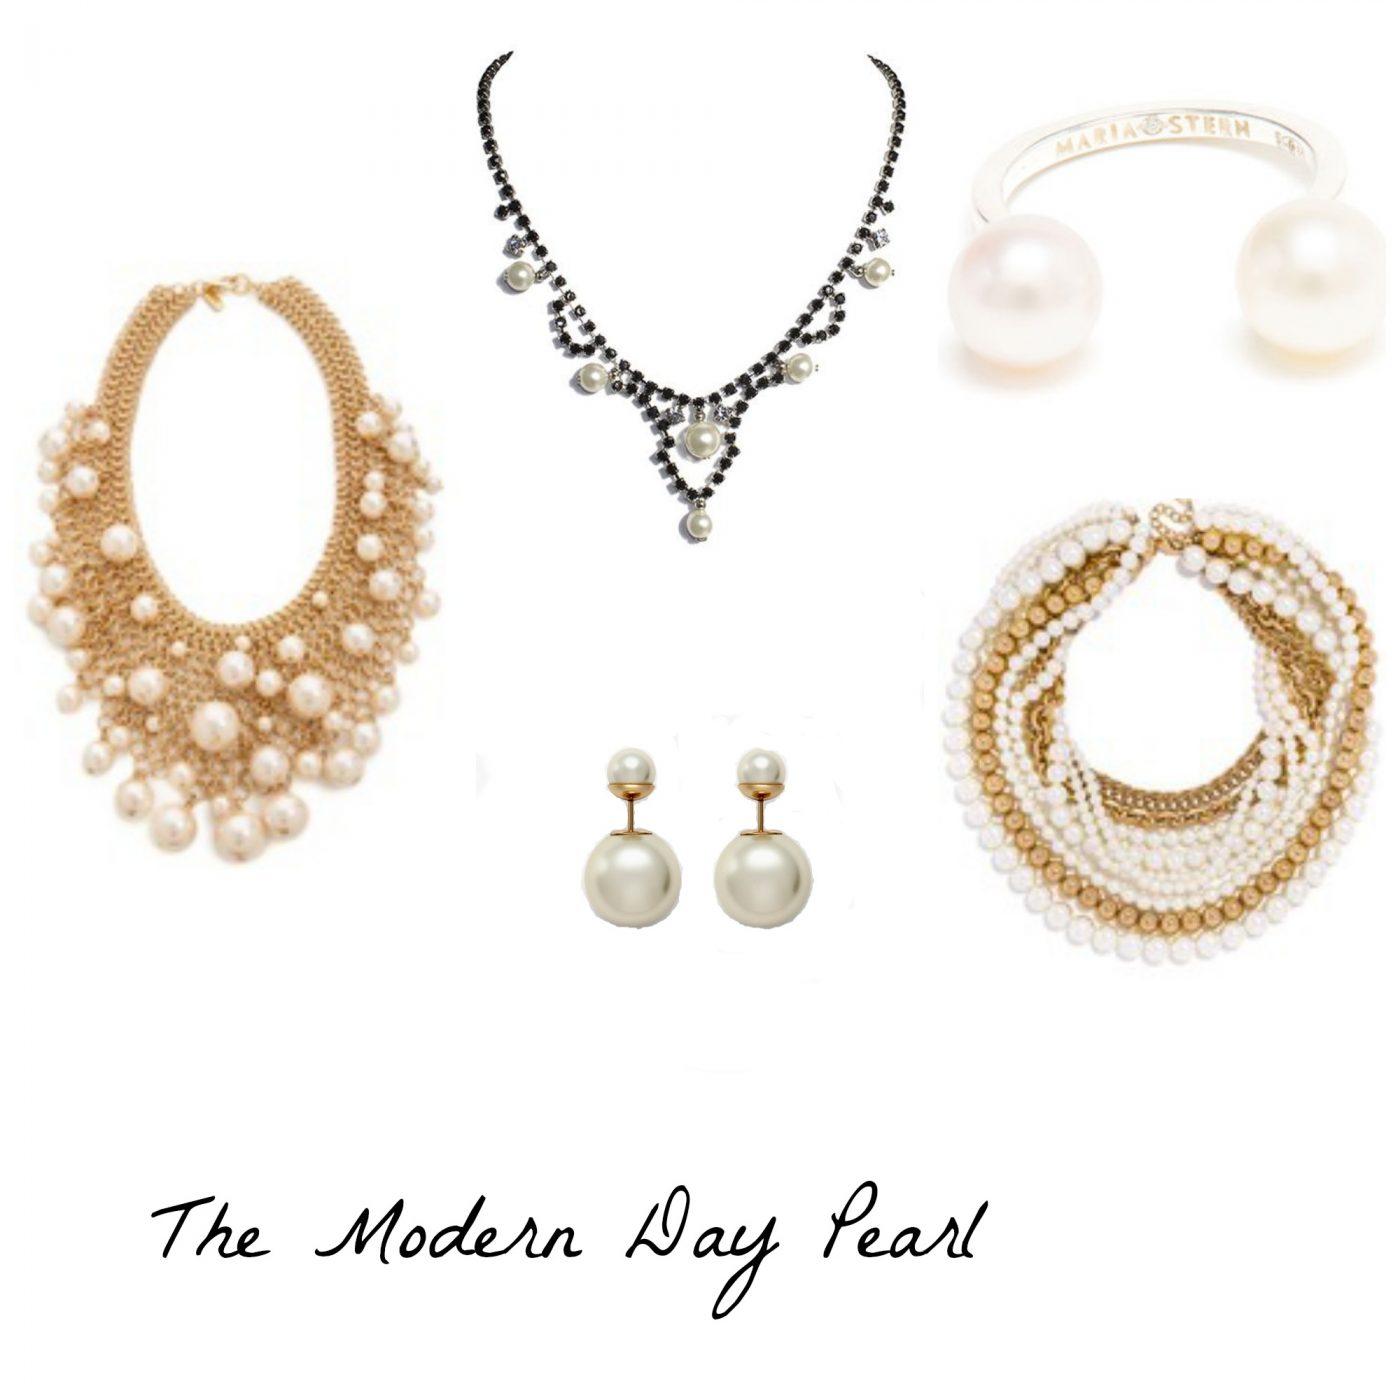 Modern Day Pearl Jewelry Trend